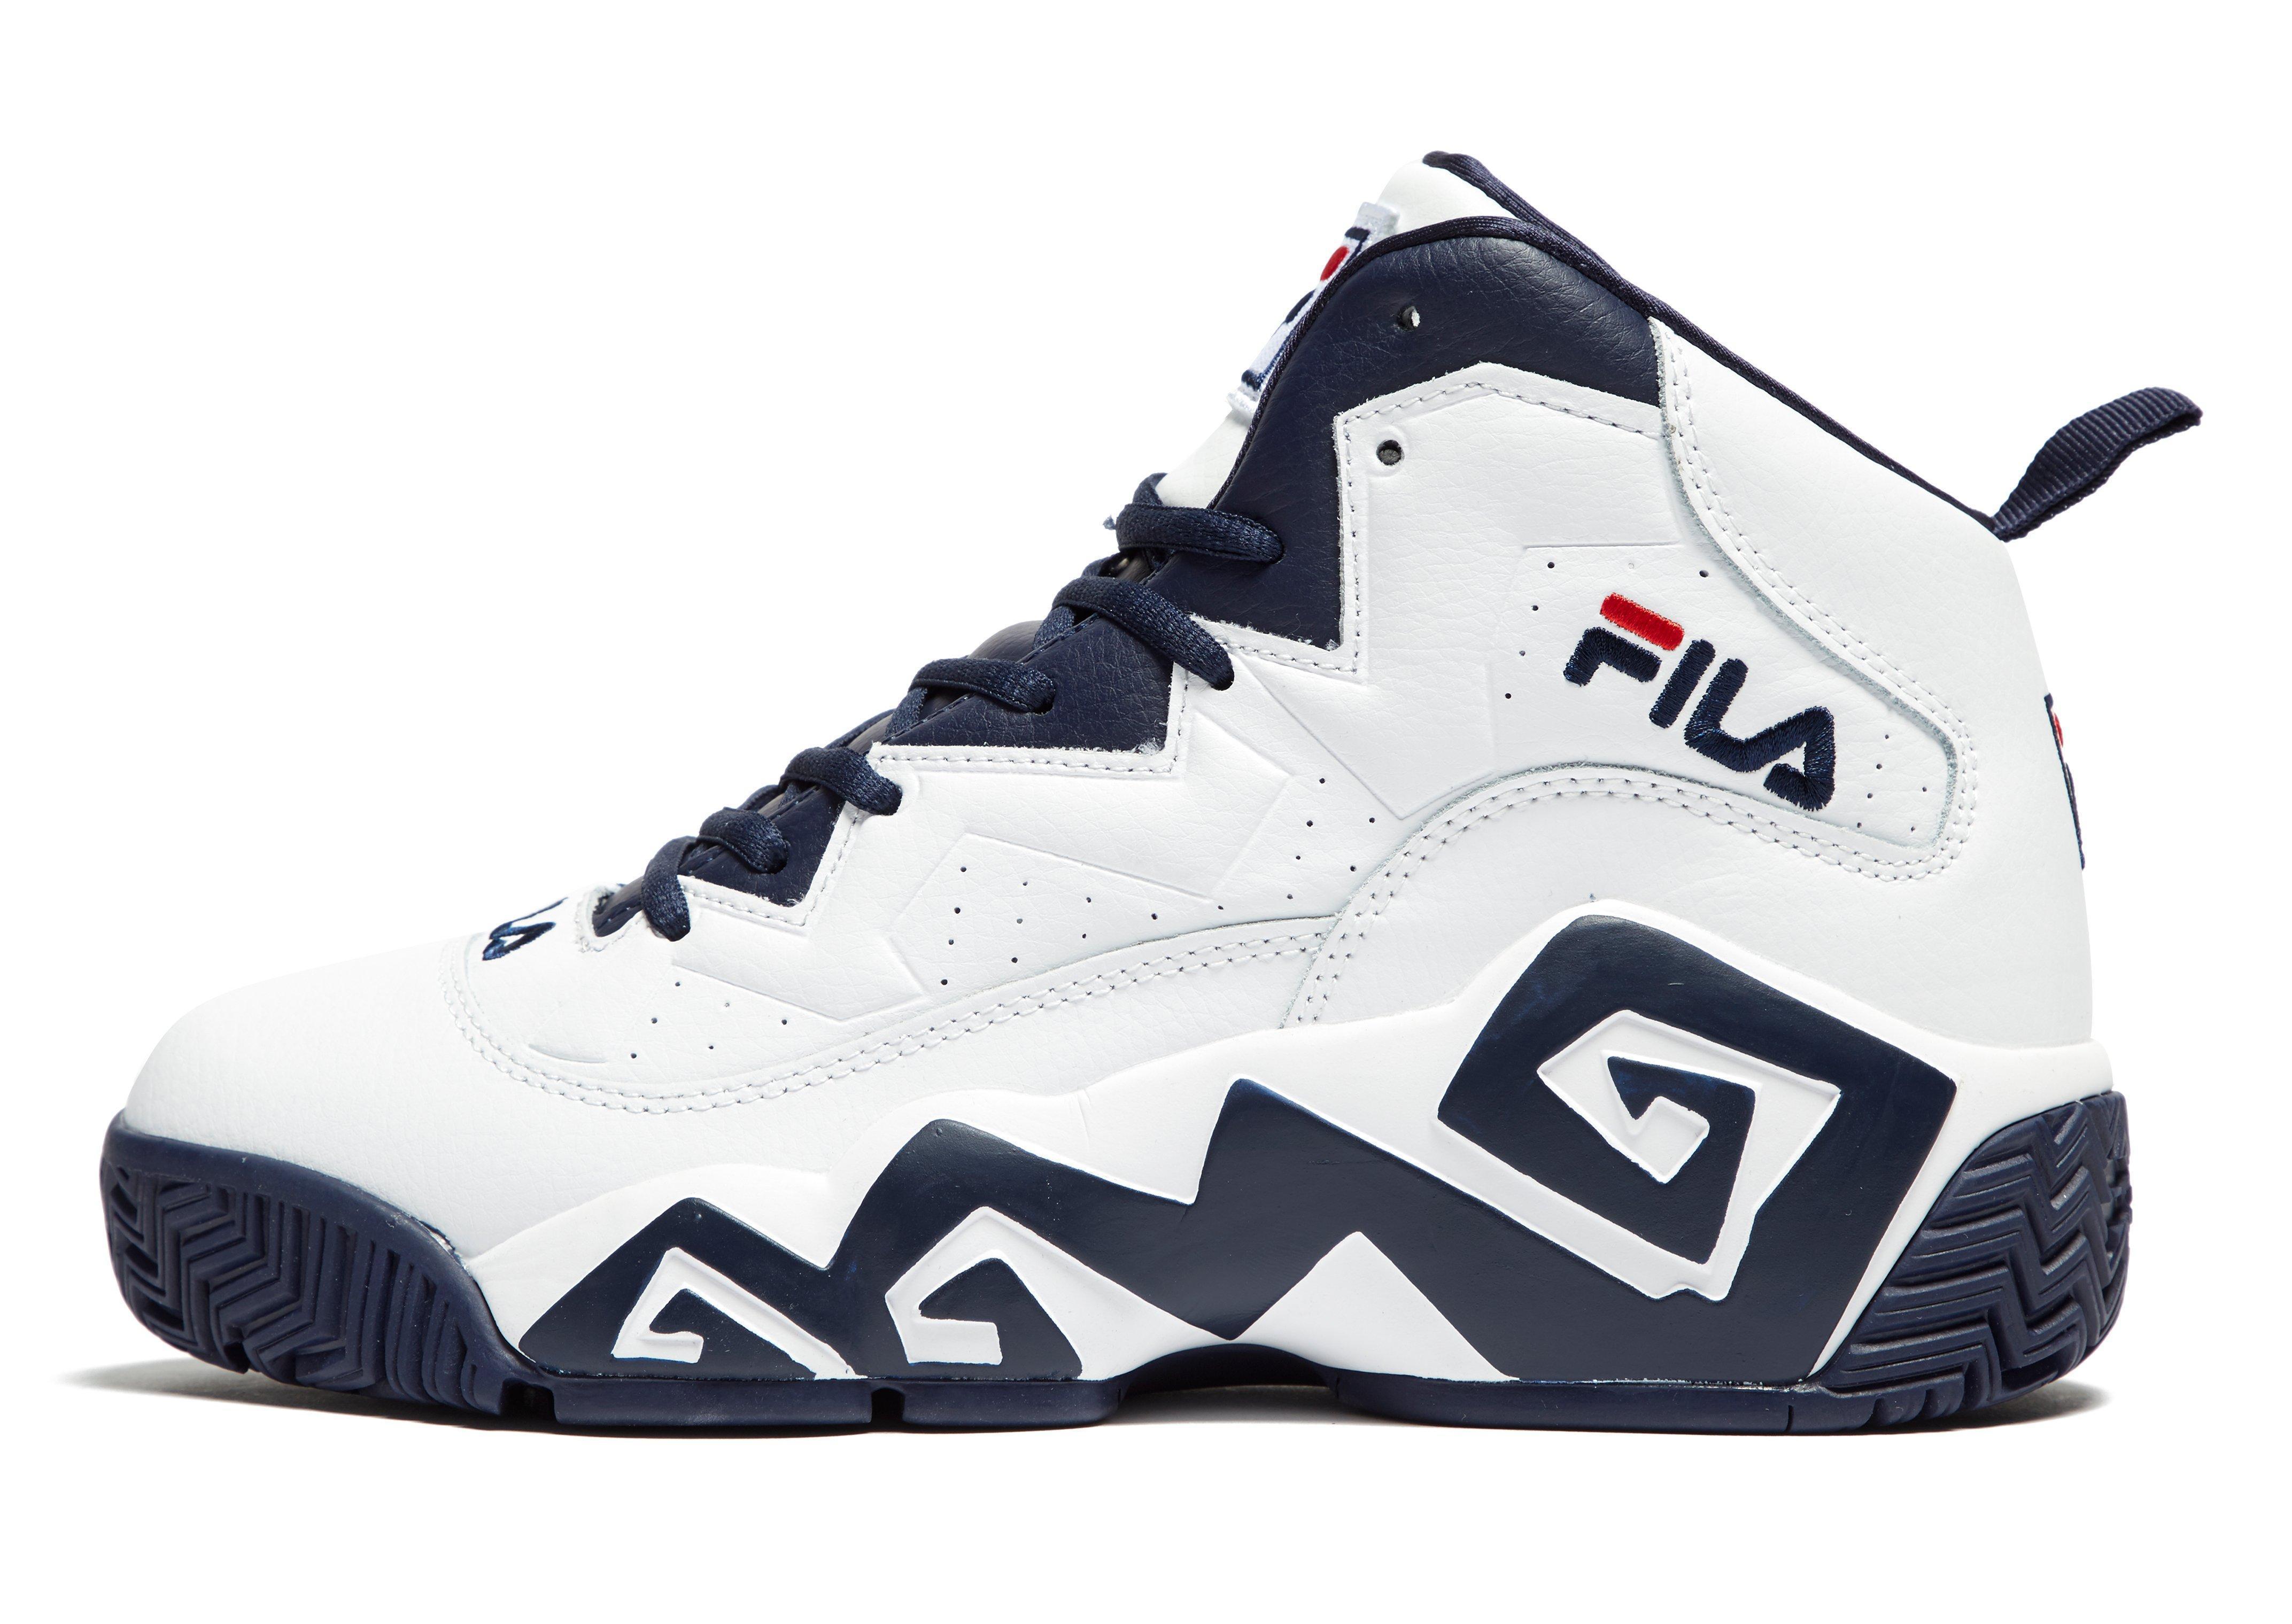 Fila Basketball Shoes Blue